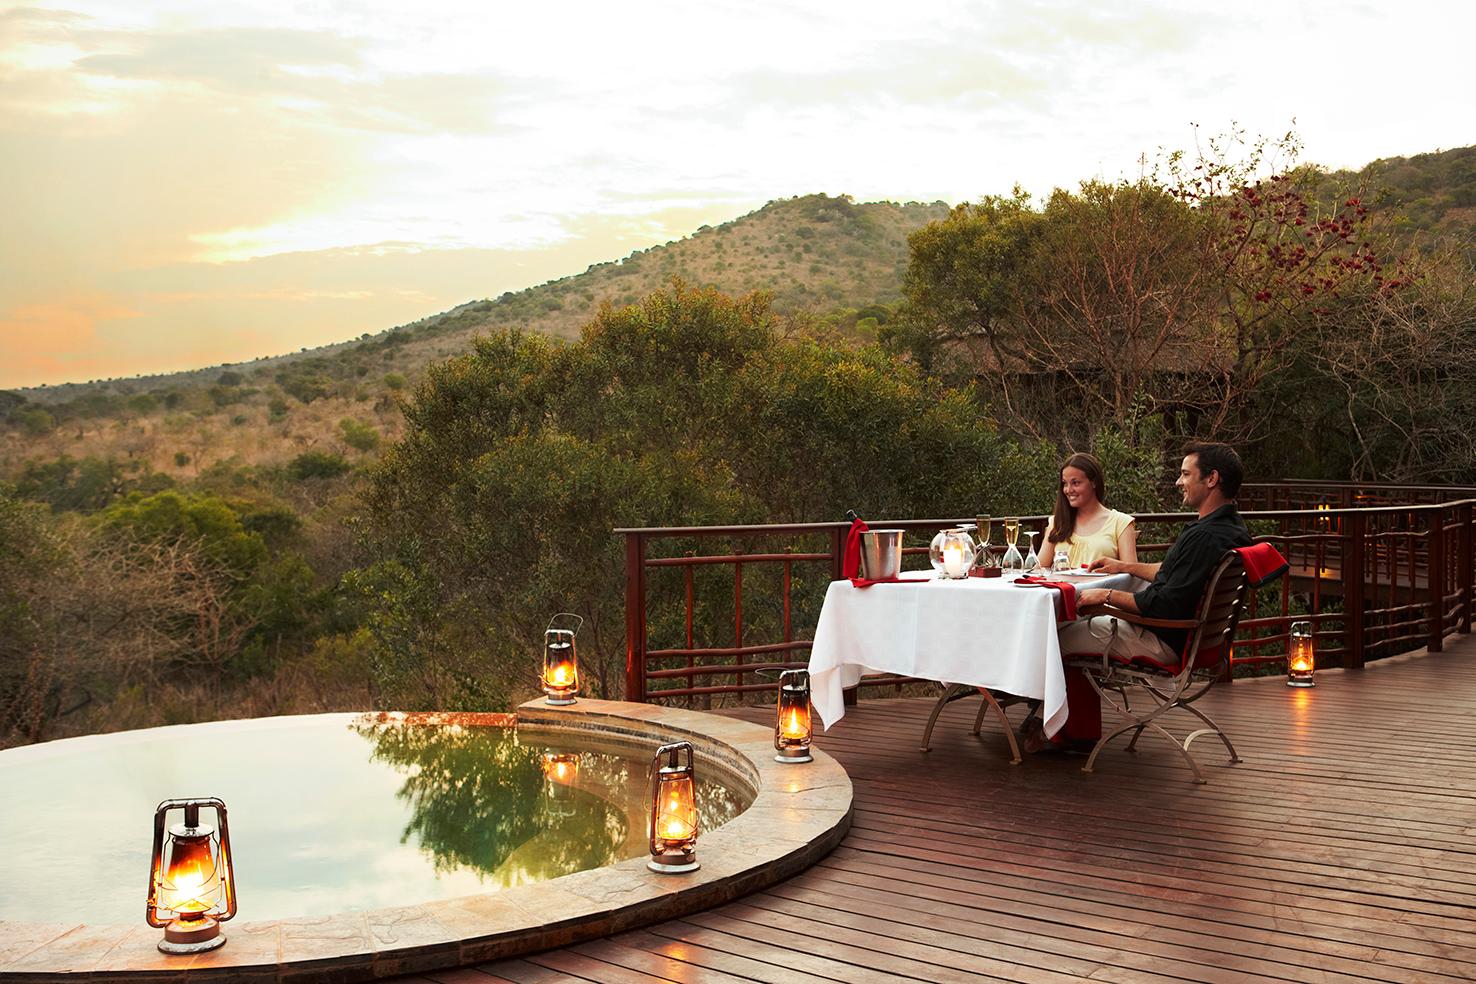 Thanda_Safari_Lodge_Private_Deck_Dining_web